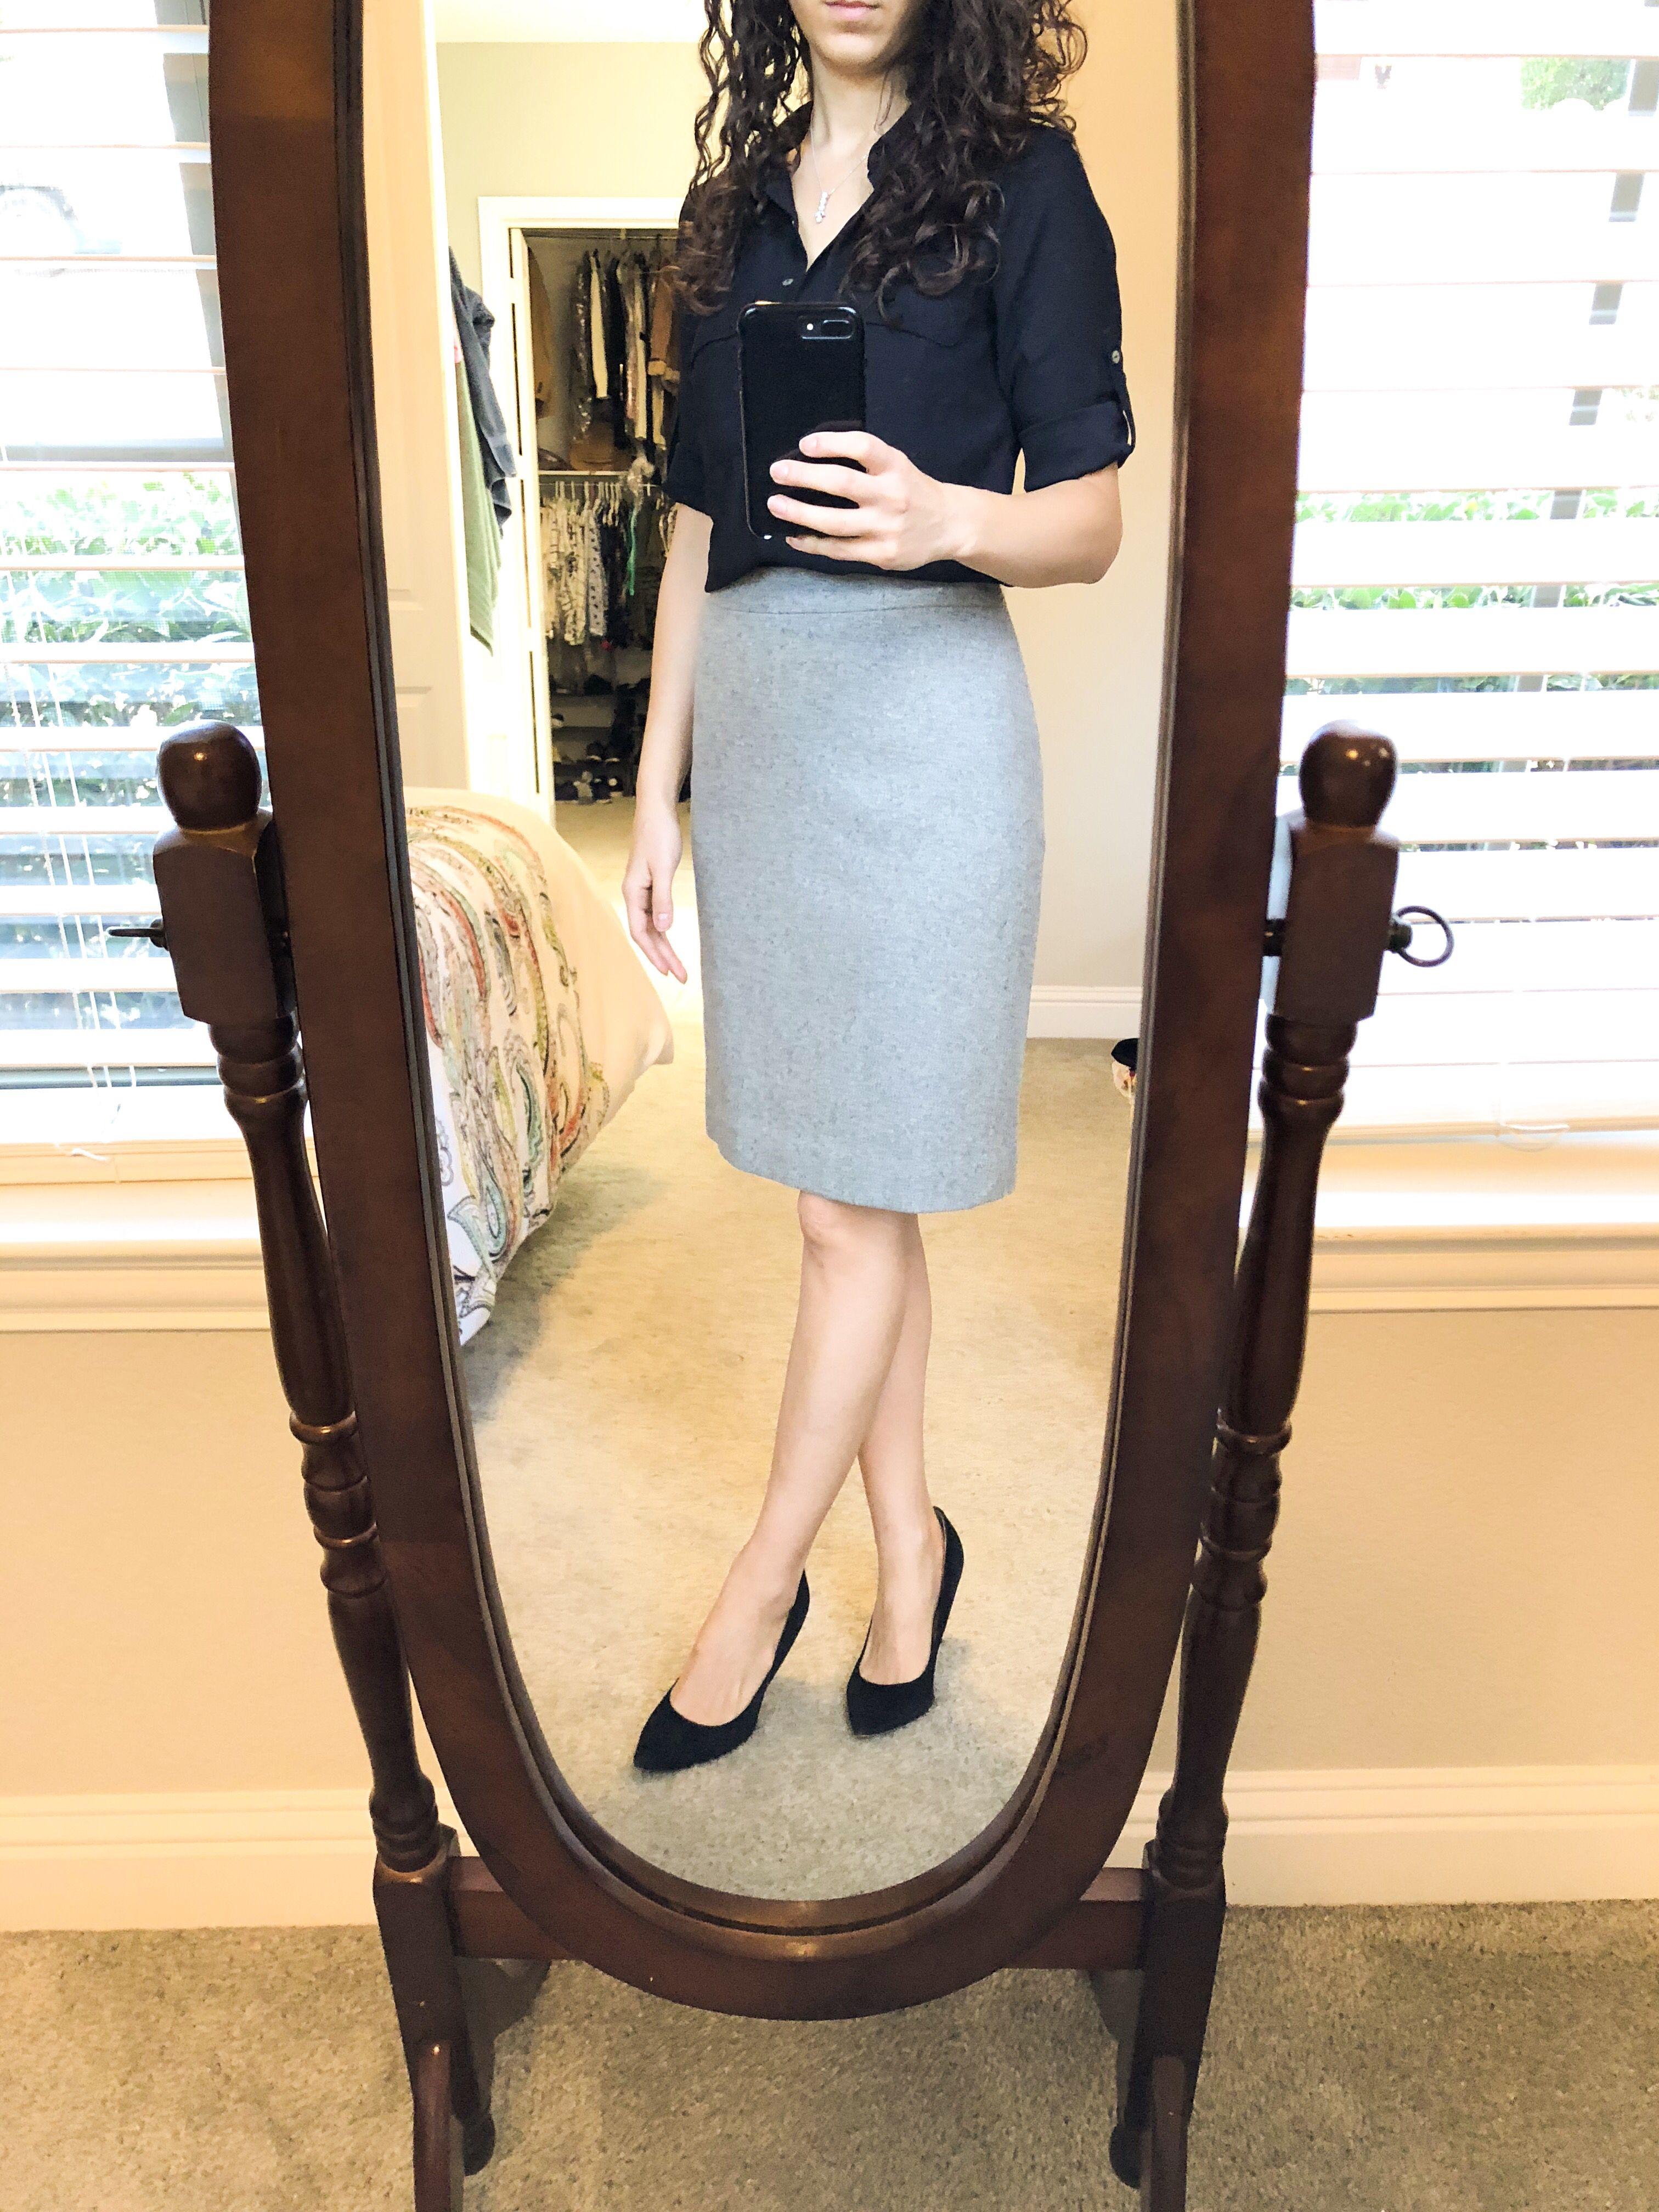 a4aac21e4f7 Fashion outfit for work. Fashion outfit for work Business Casual Outfits  For Women